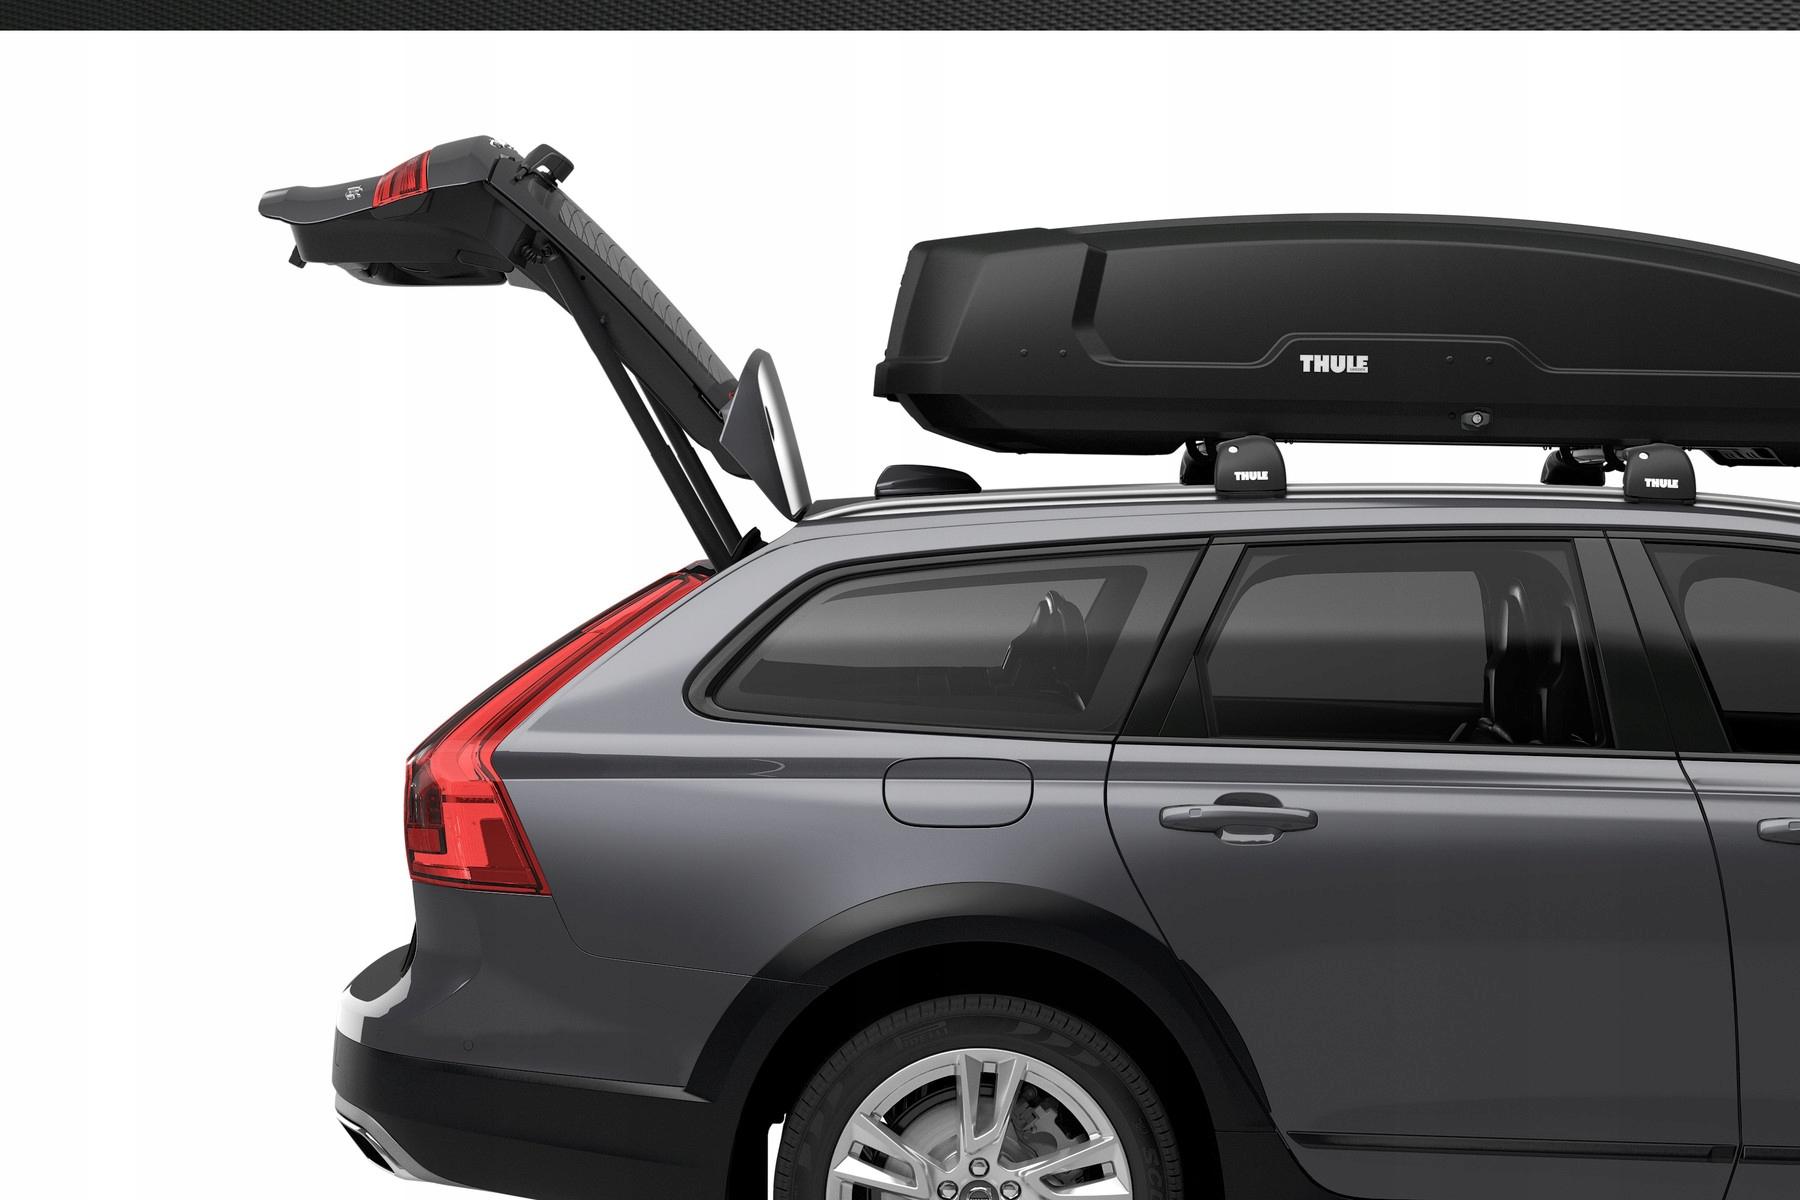 Bagażnik na dach BOKS KUFER THULE FORCE XT SPORT Wysokość produktu 42.5 cm